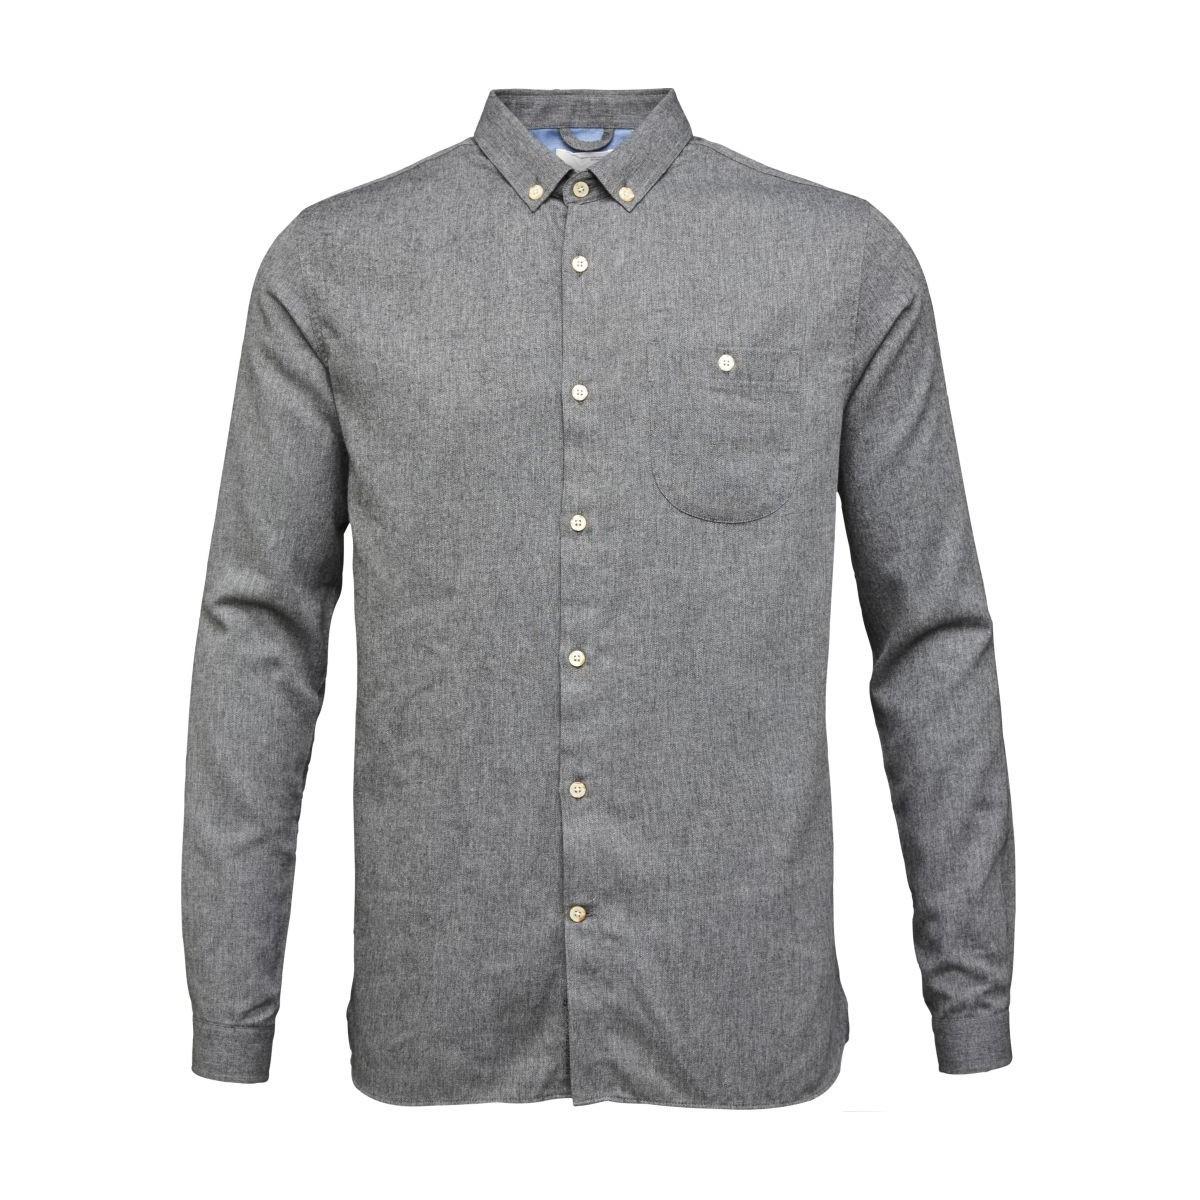 Melange Effect Flannel Shirt - Dark Grey Melange